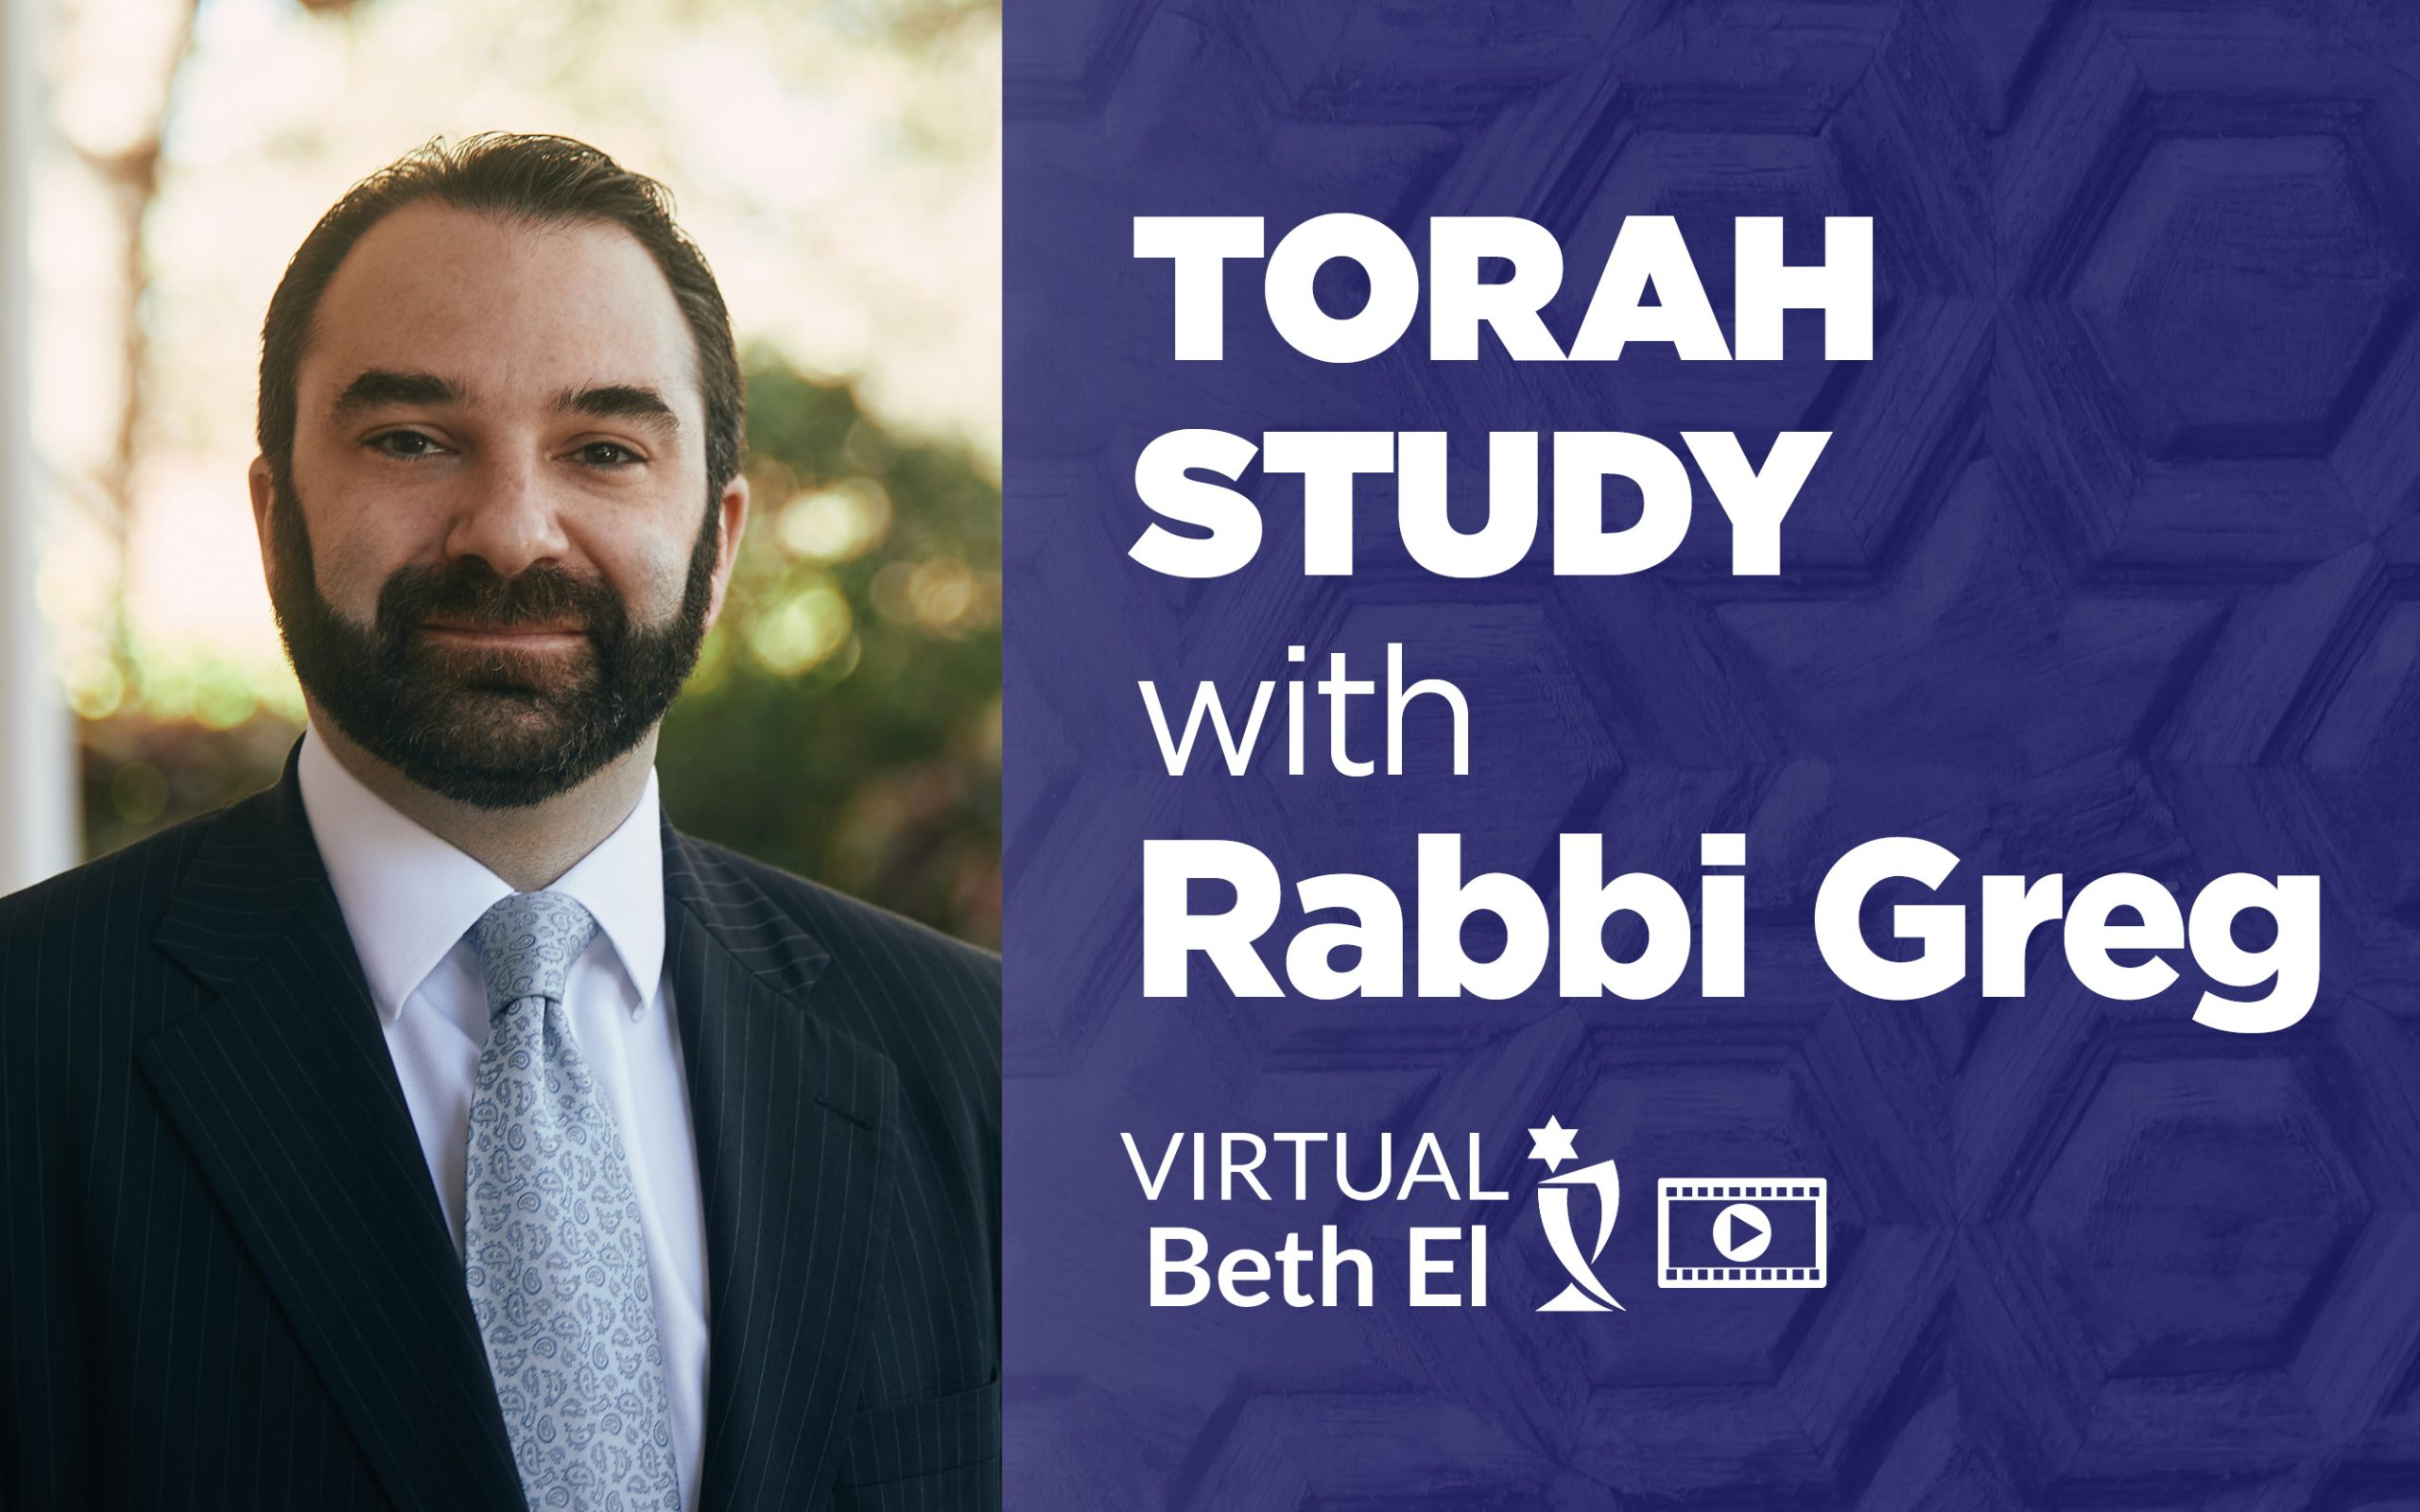 Torah Study with Rabbi Greg Weisman event graphic for Virtual Beth El Temple Beth El of Boca Raton